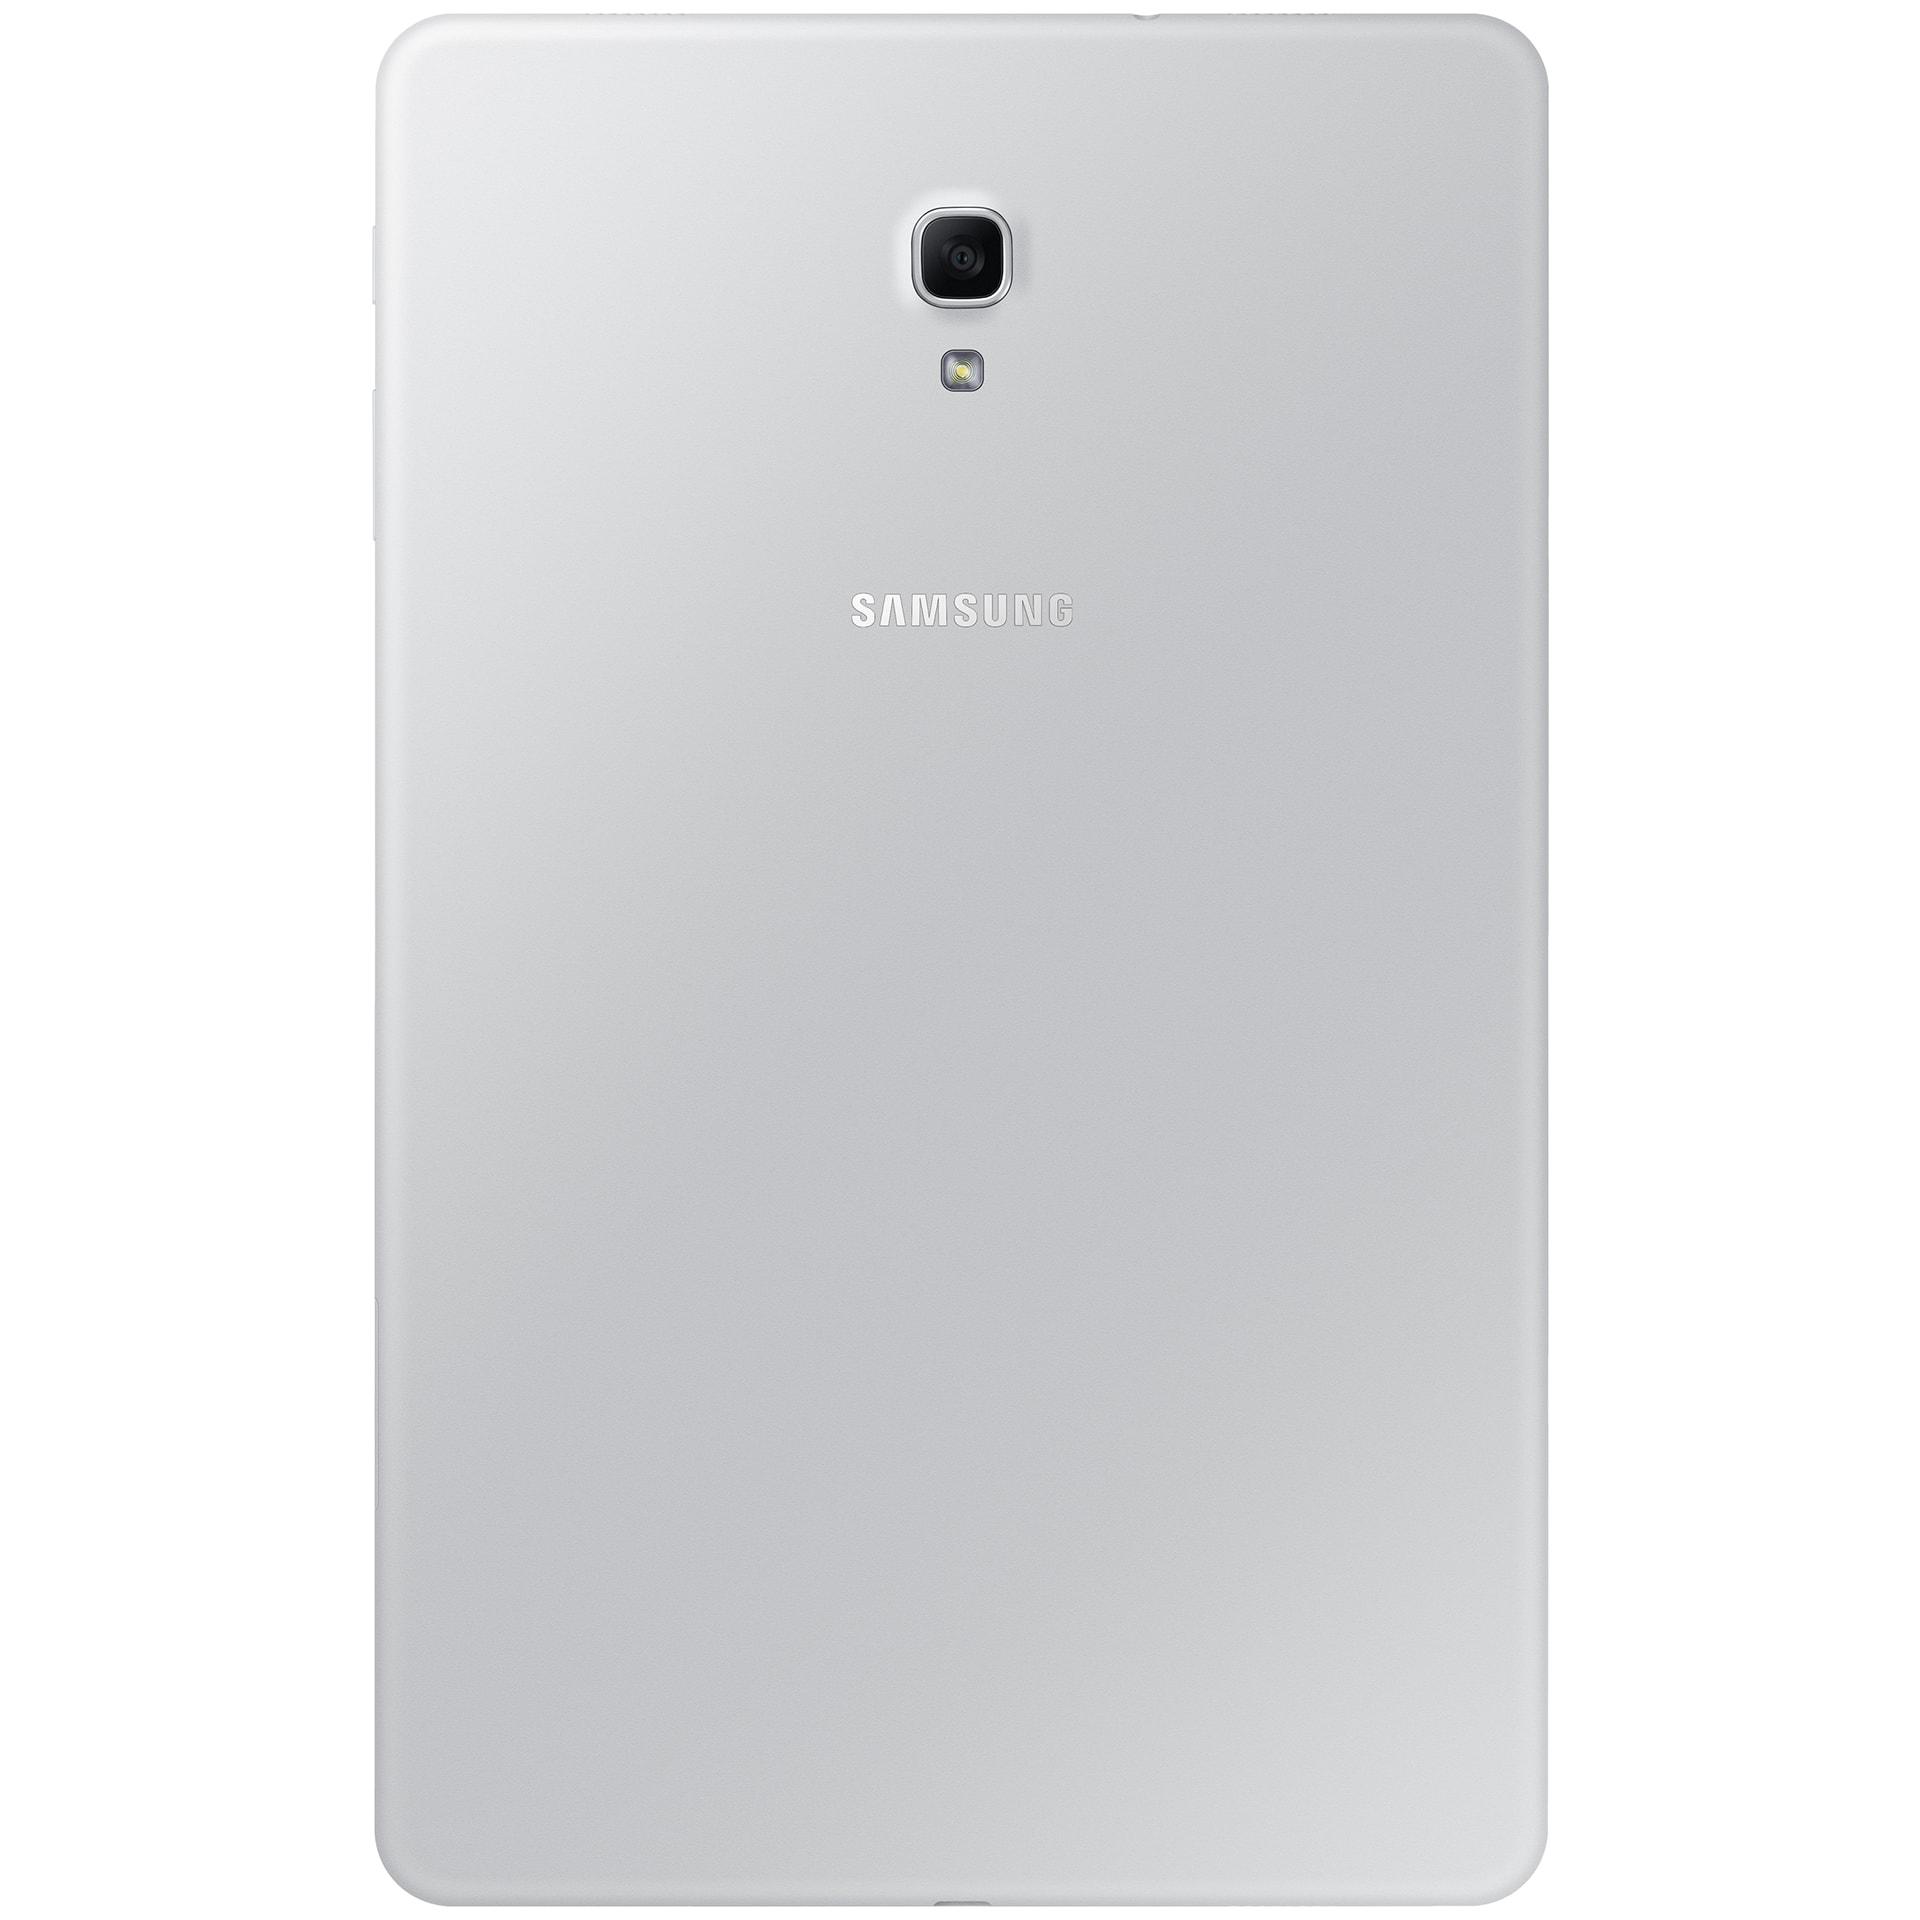 tahvelarvuti Samsung Galaxy Tab A 10.5 LTE (hall)